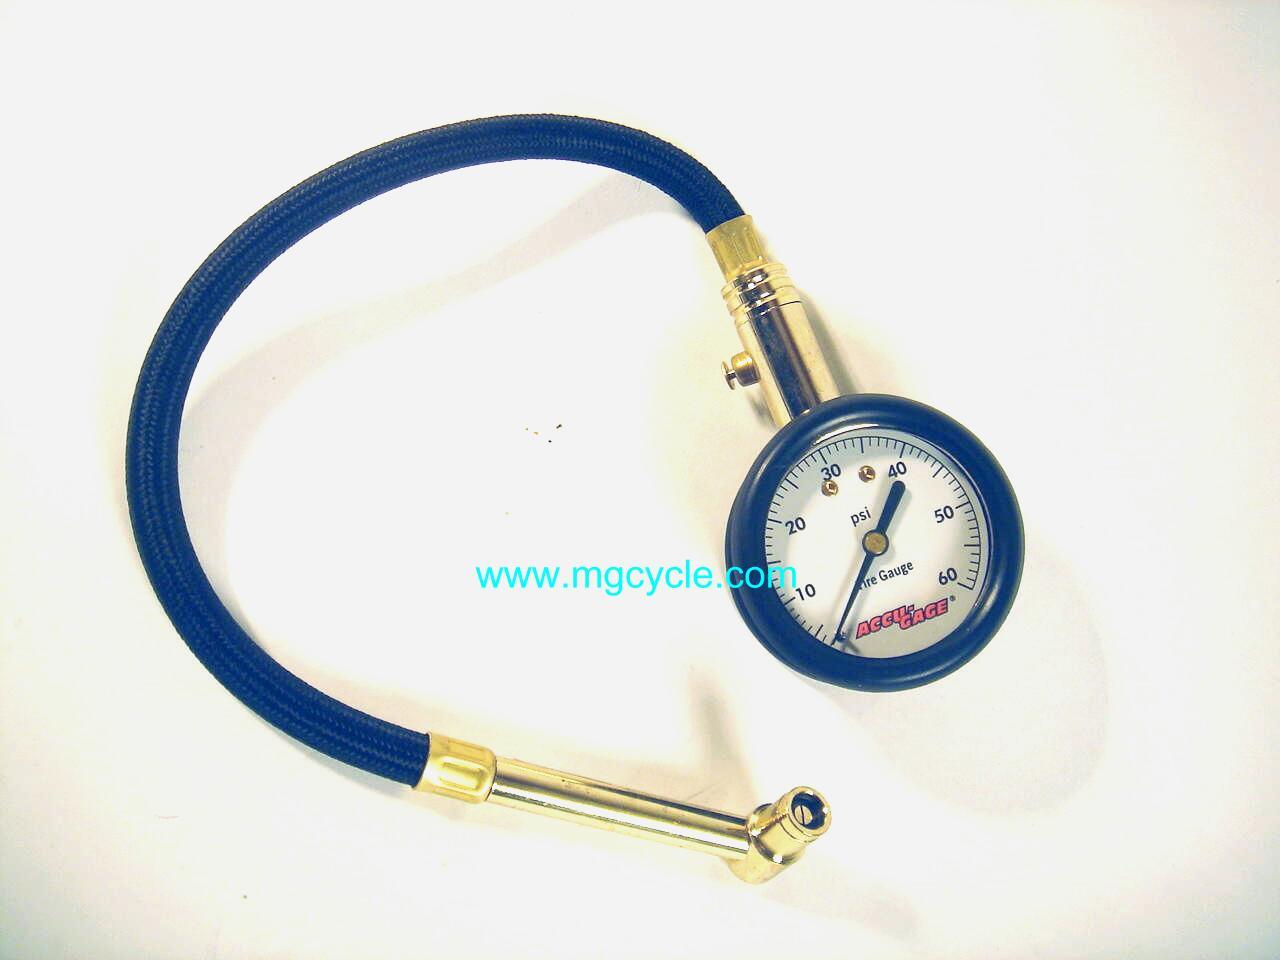 Guzzi Jackal Tire Pressure